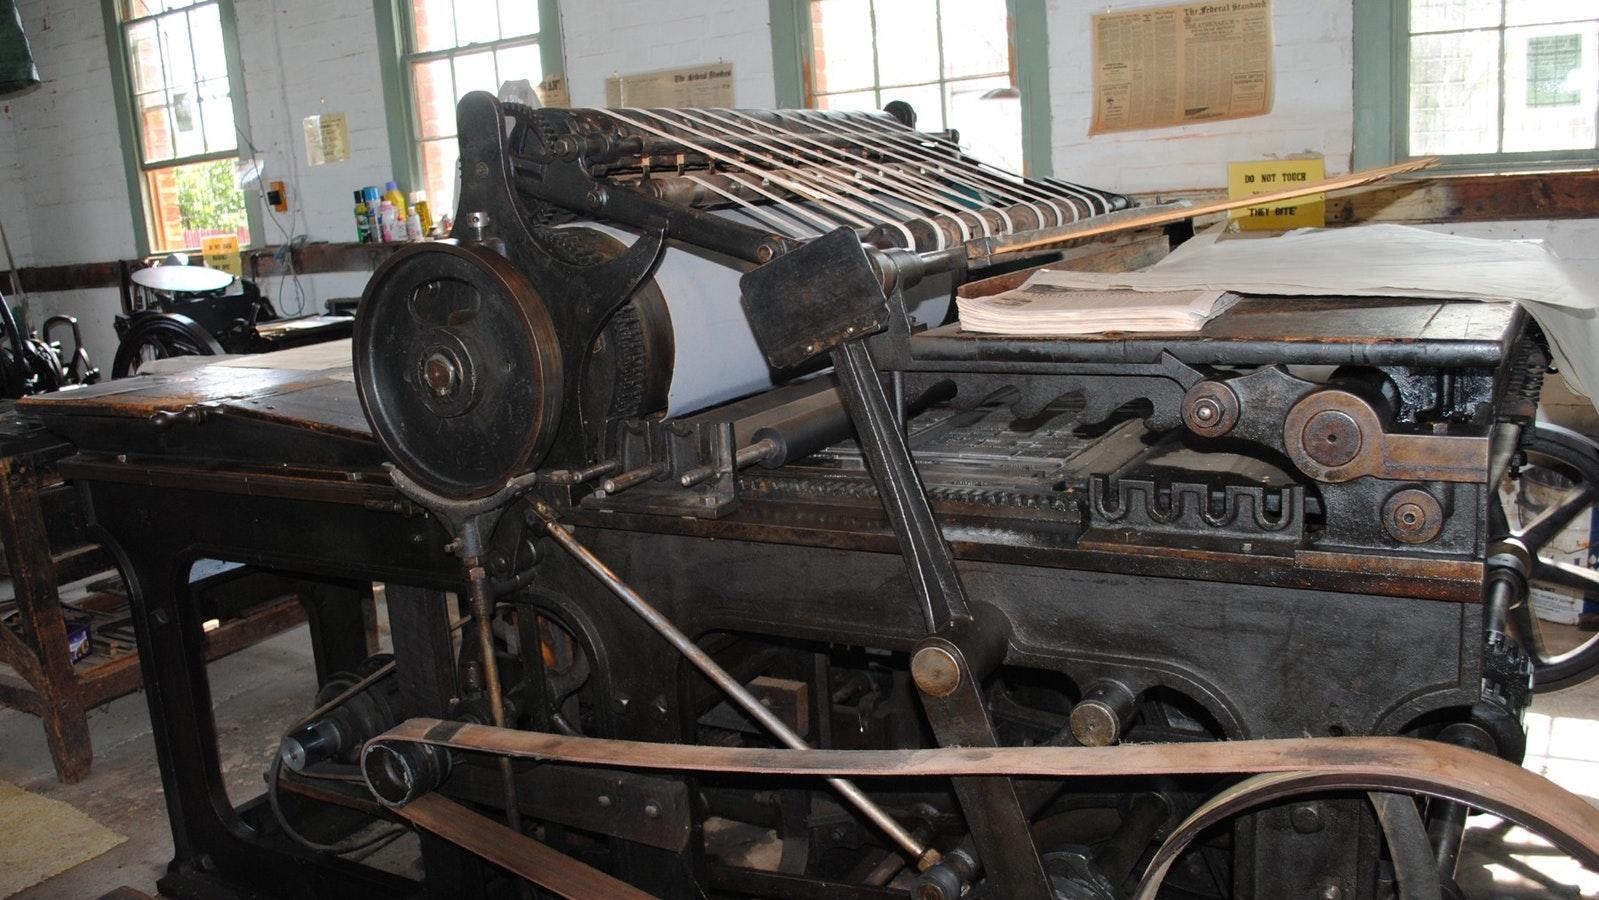 The Federal Standard Printing Works